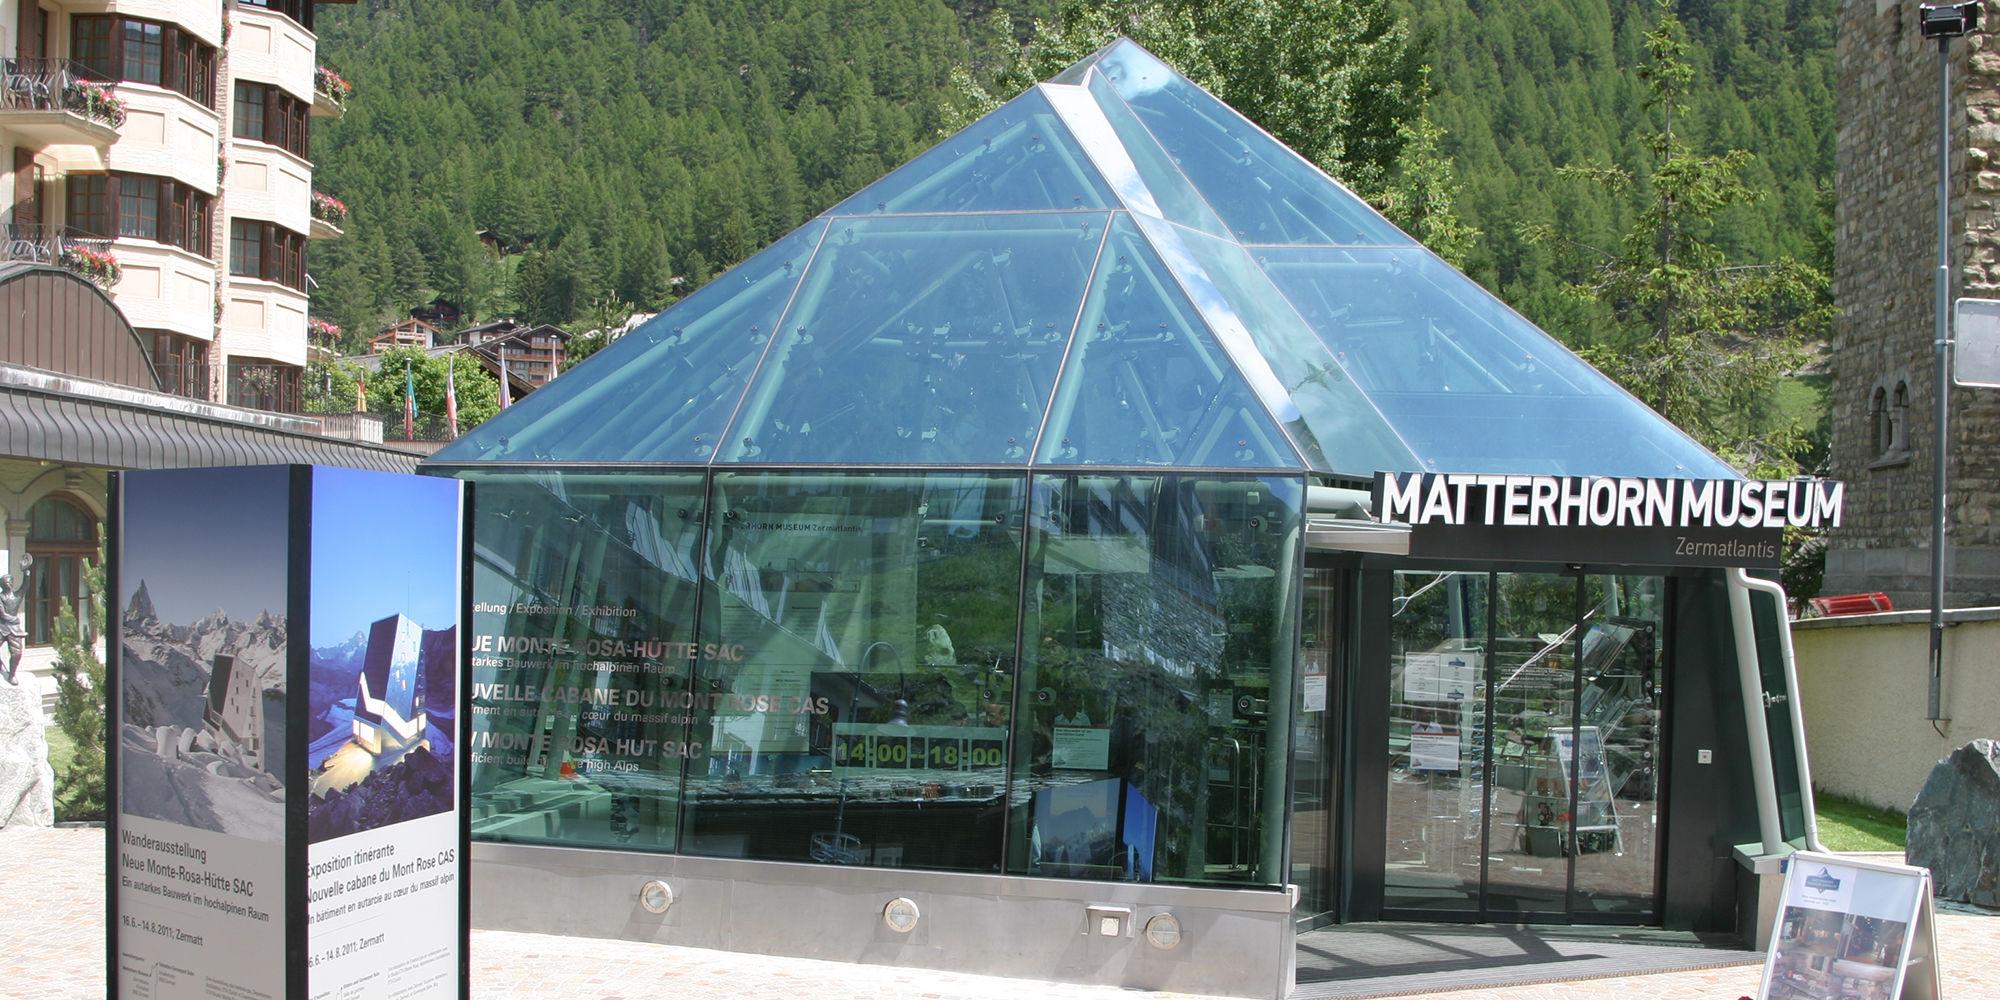 Matterhorn Museum in Zermatt